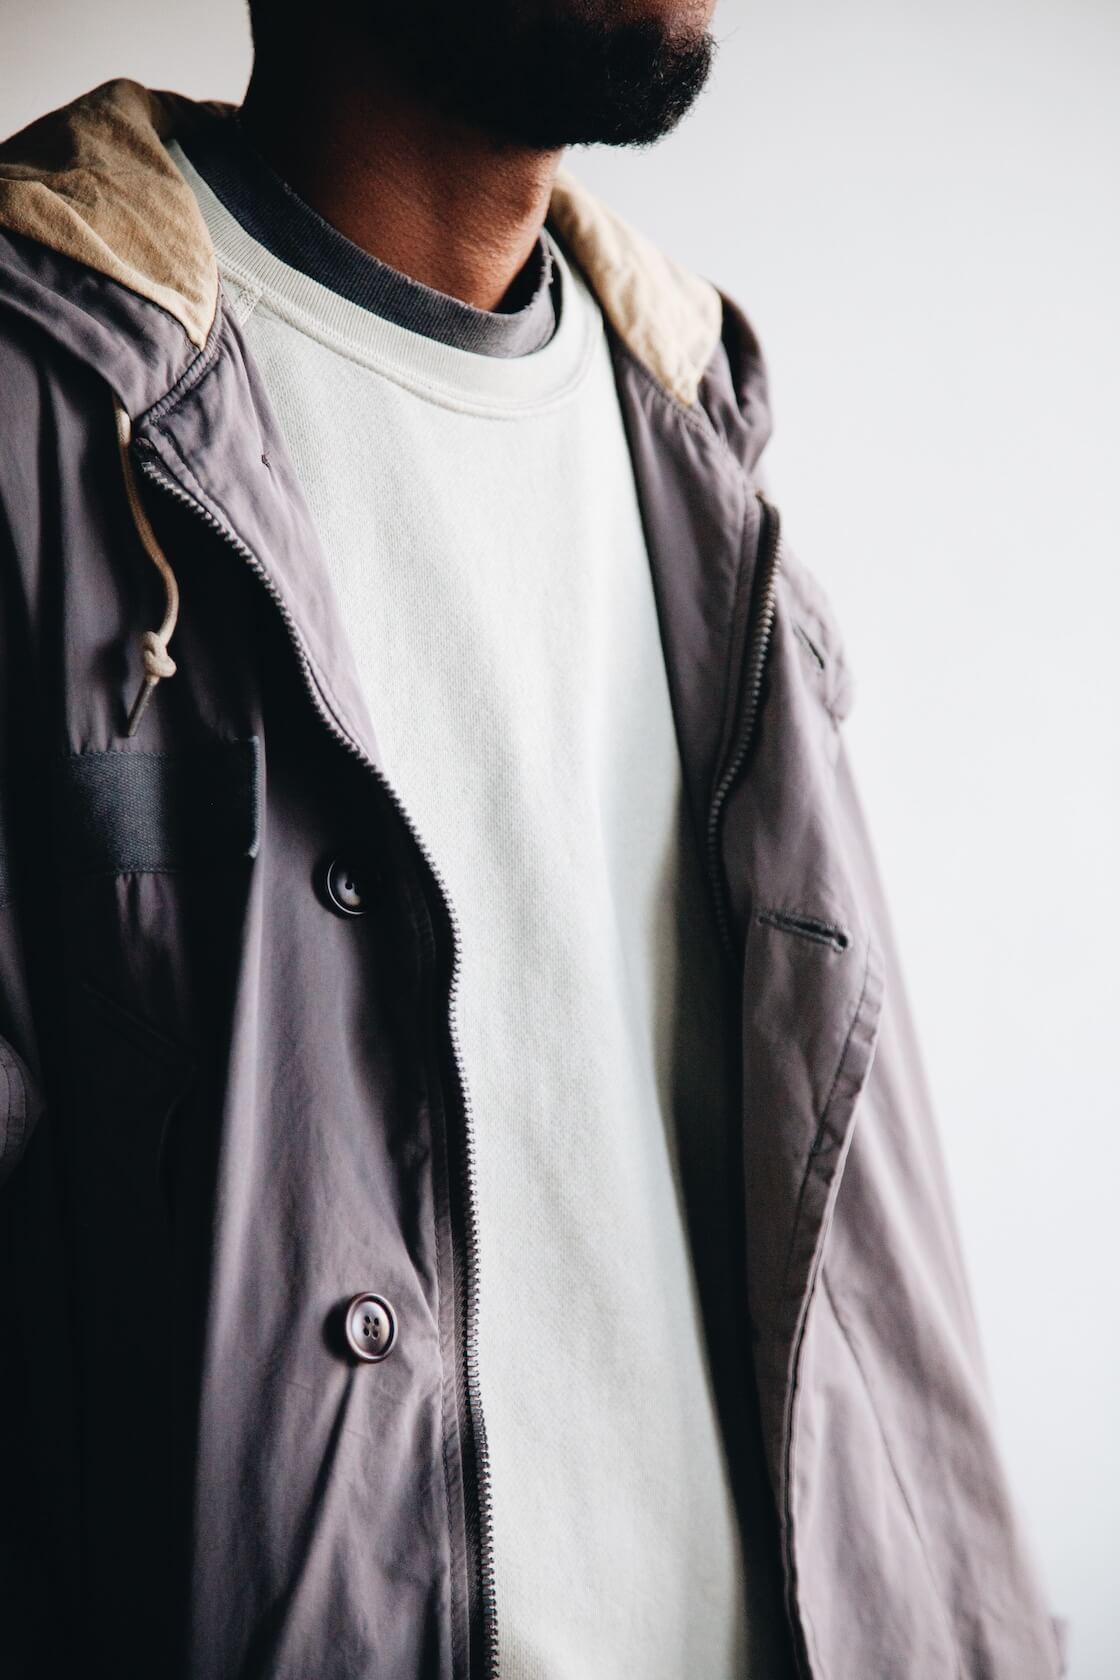 hender scheme 2 tone wool cap, visvim patterson overcoat, velva sheen freedom sweatshirt on body